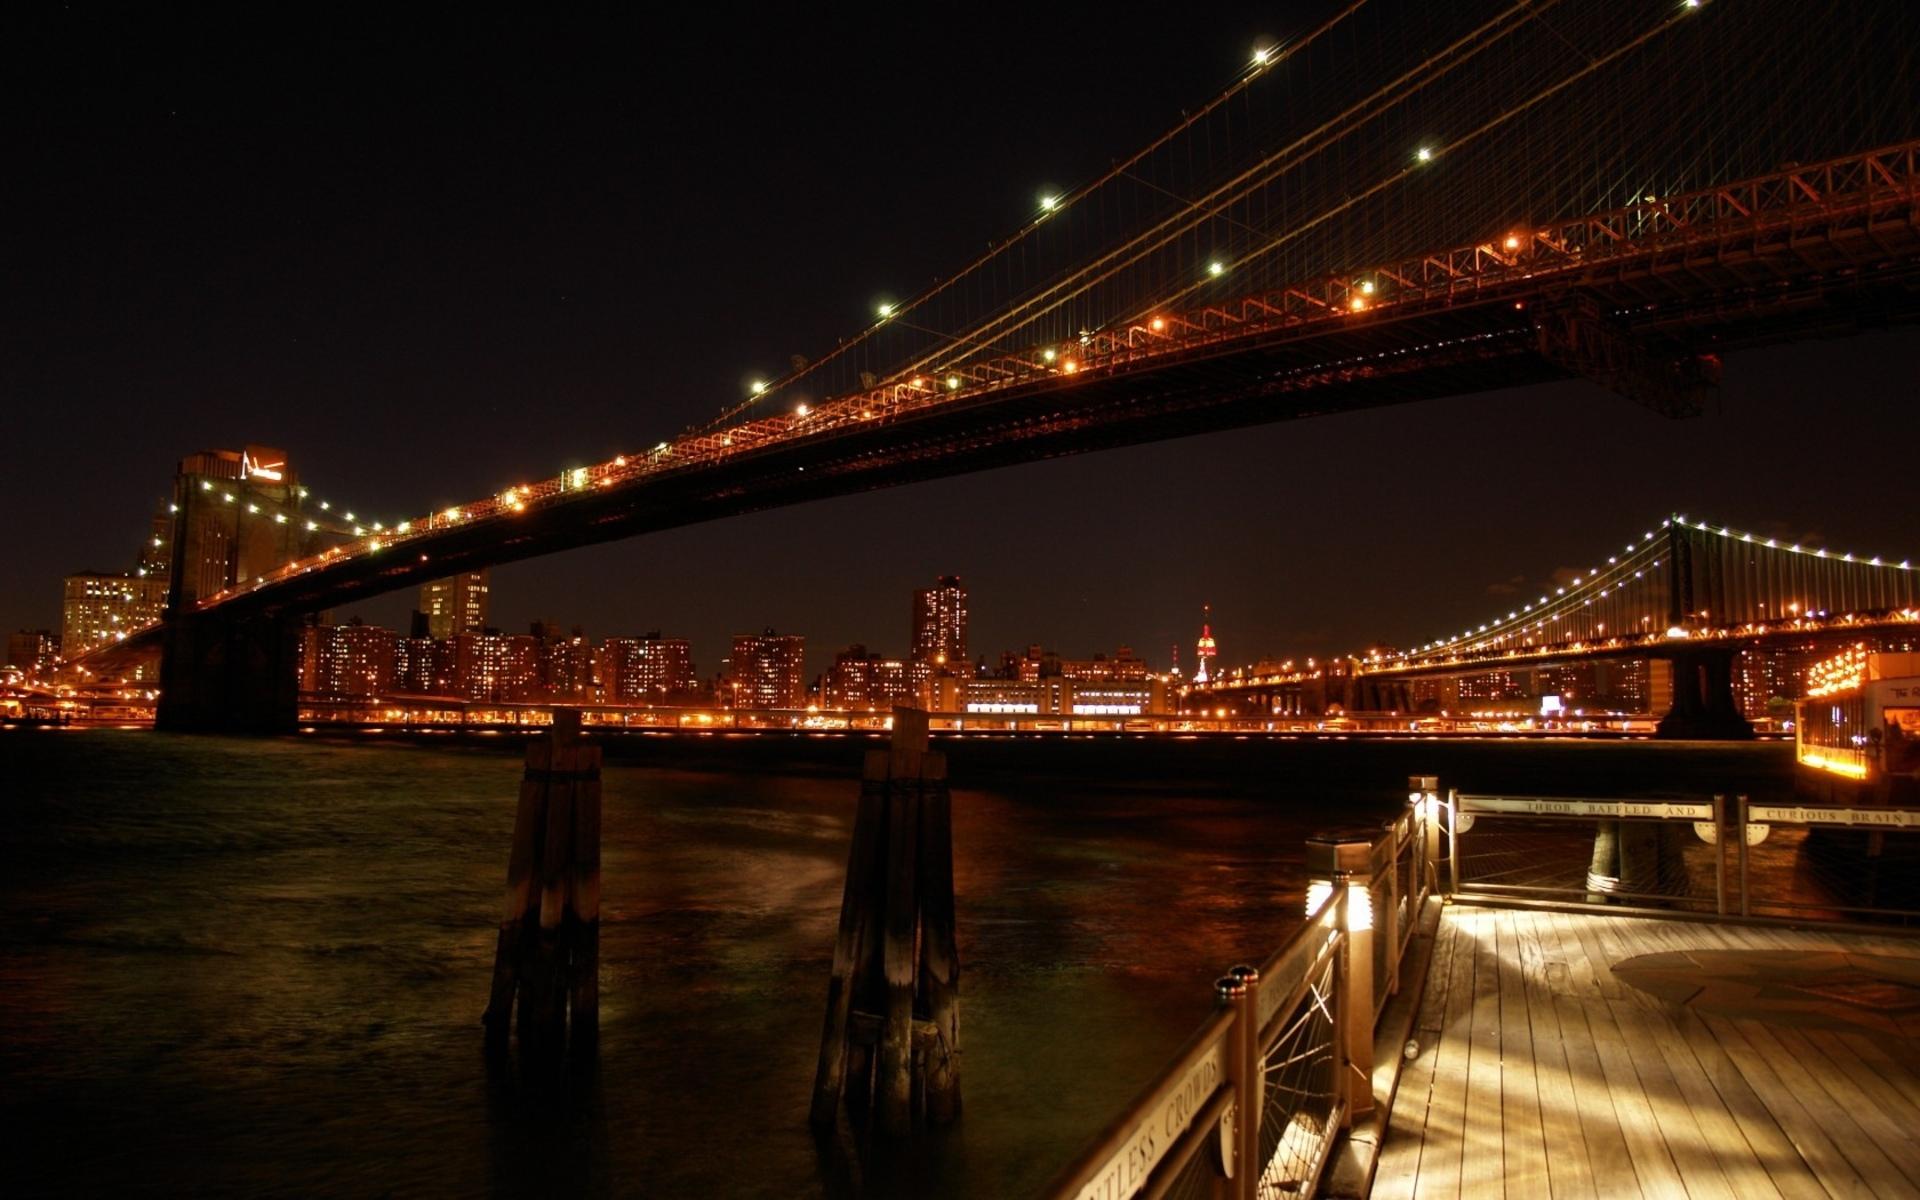 light bridge wallpaper - photo #29